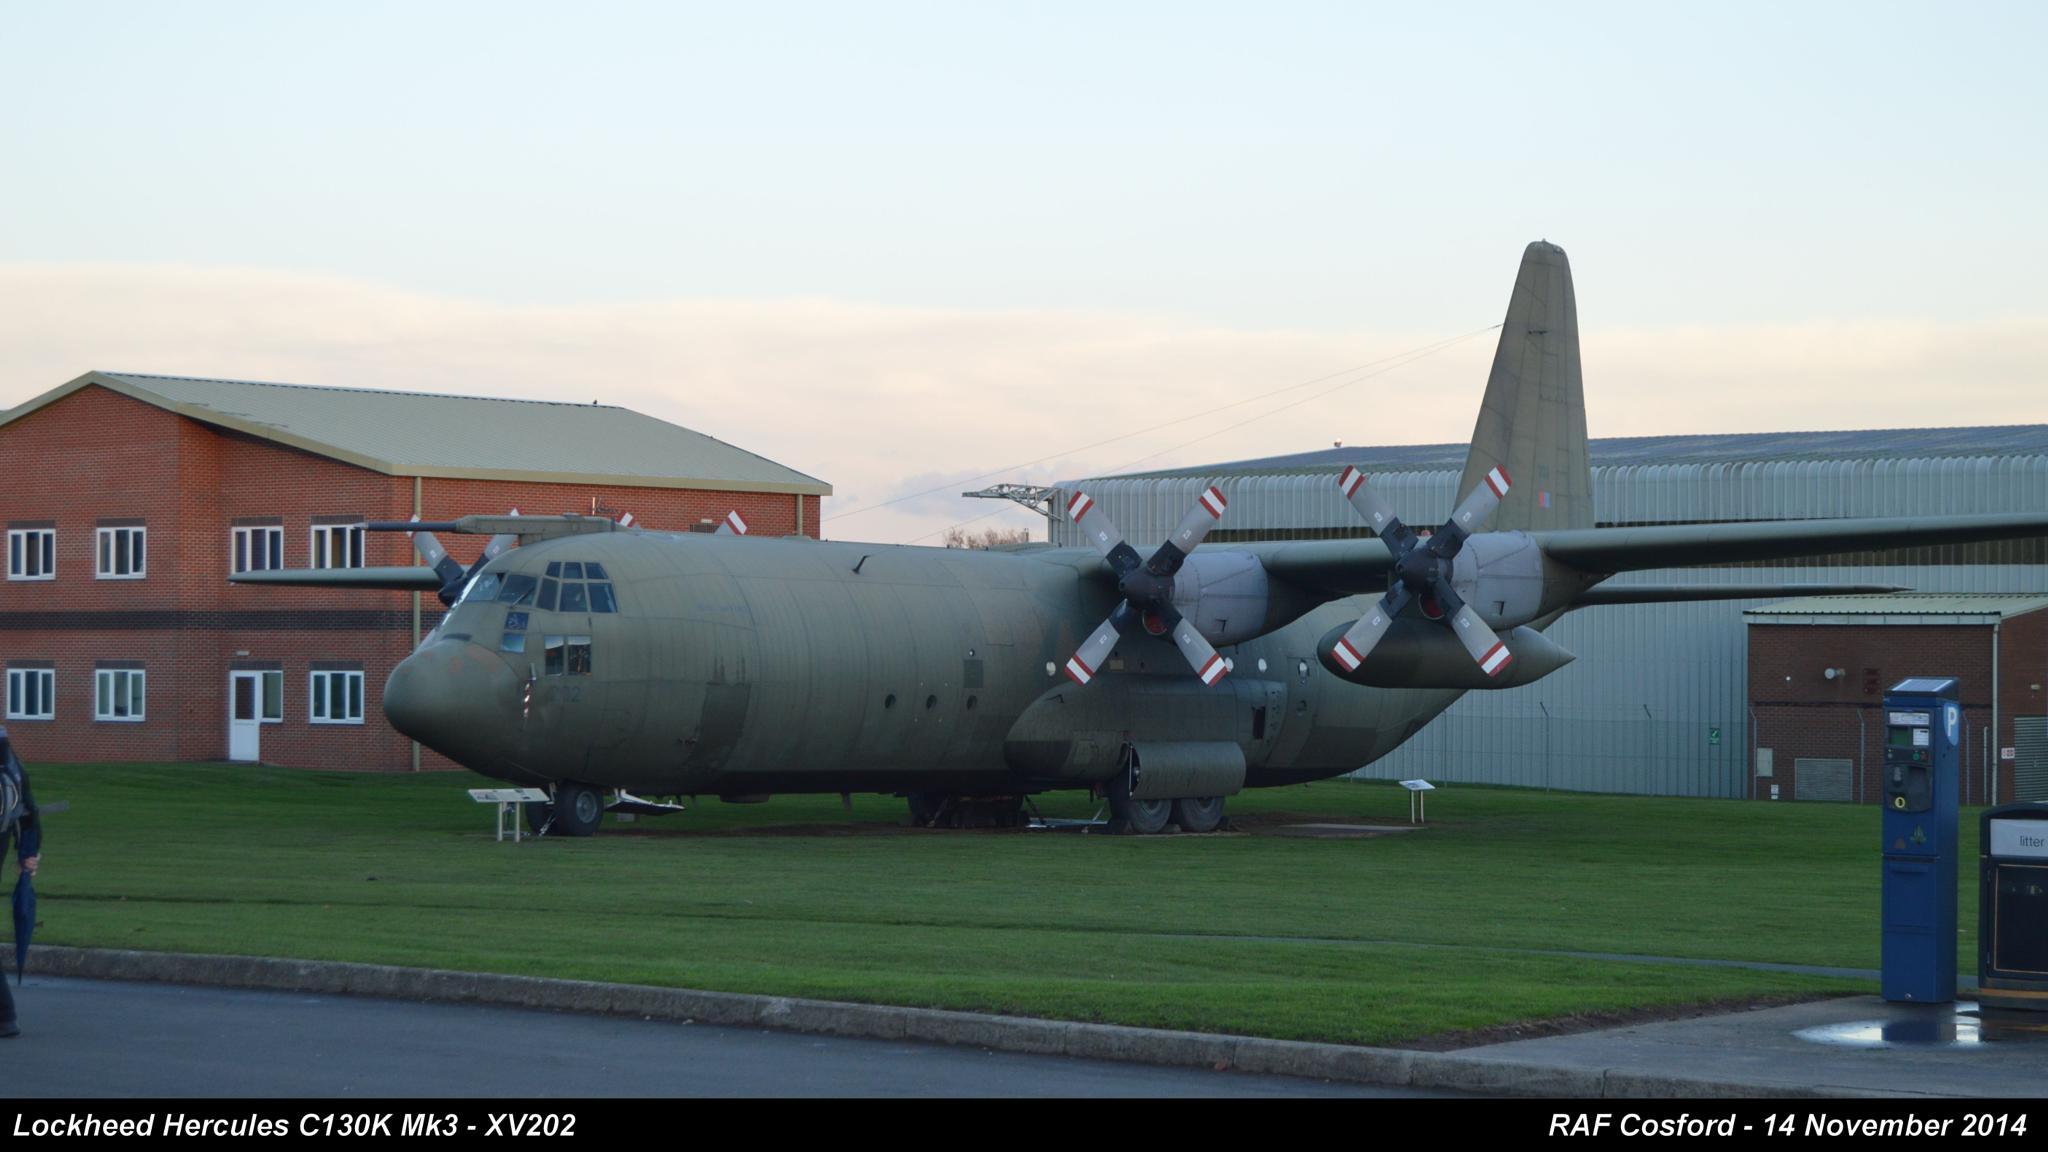 Lockheed Hercules C130K Mk3 - XV202 by Graham Wood Photo Collection